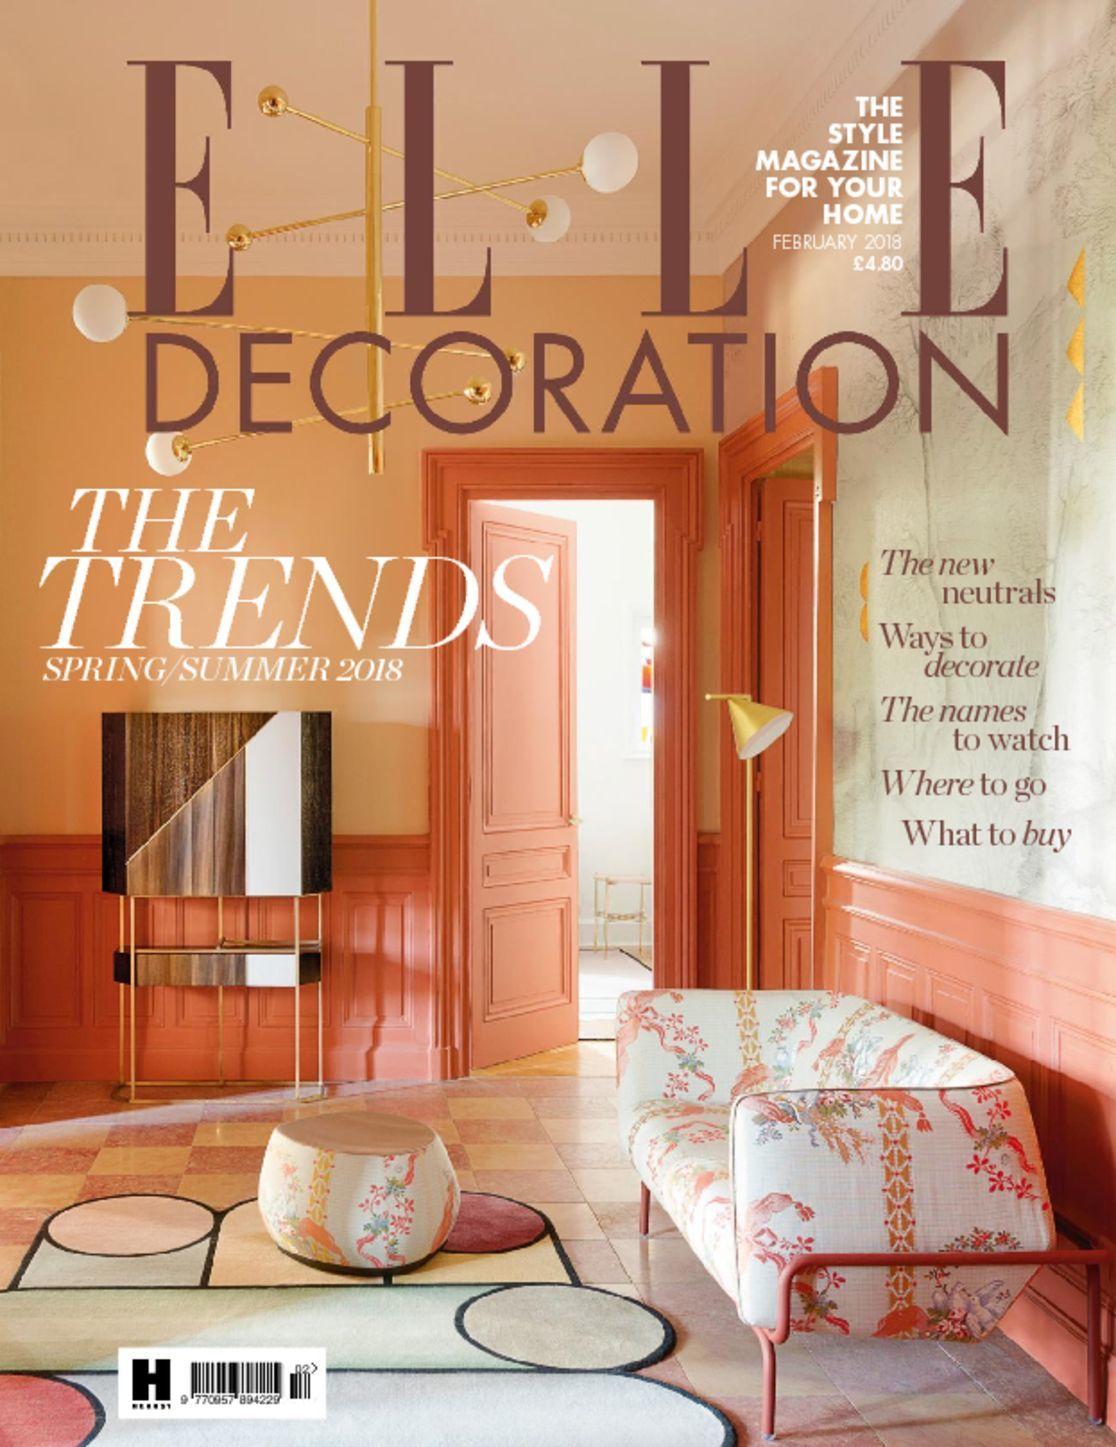 Elle decoration uk magazine digital for Elle decoration uk